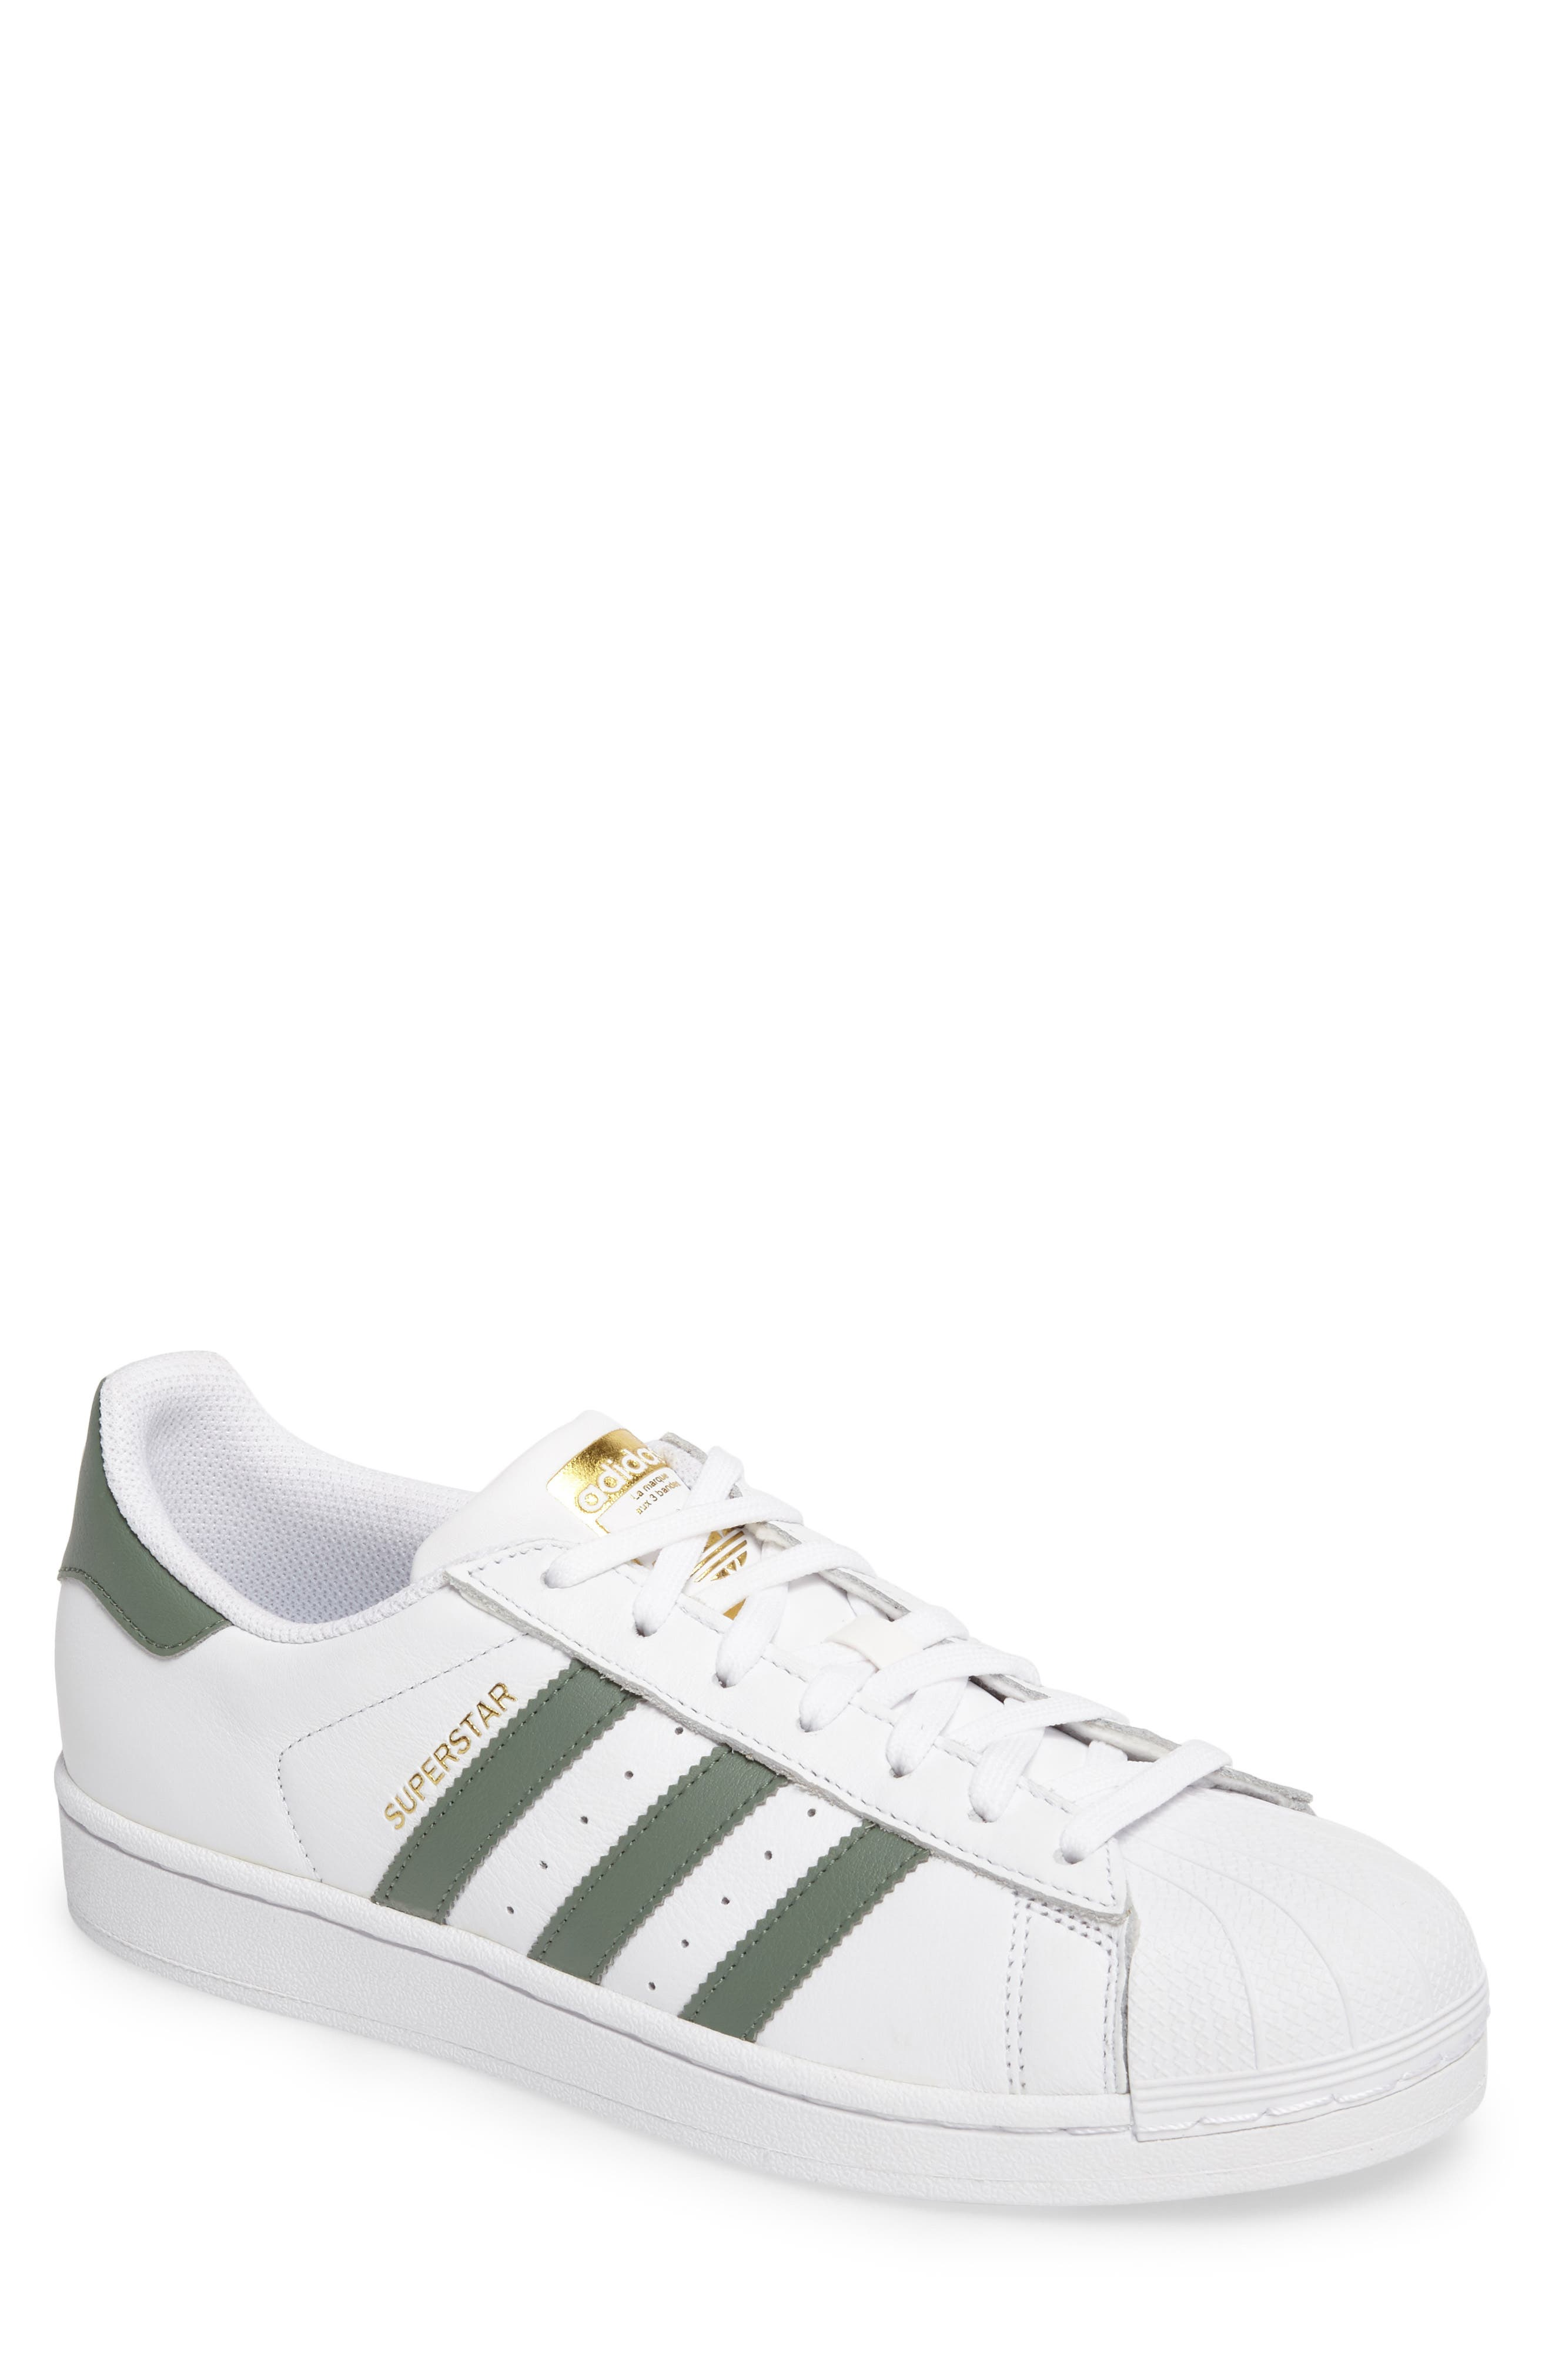 Superstar Sneaker,                             Main thumbnail 8, color,